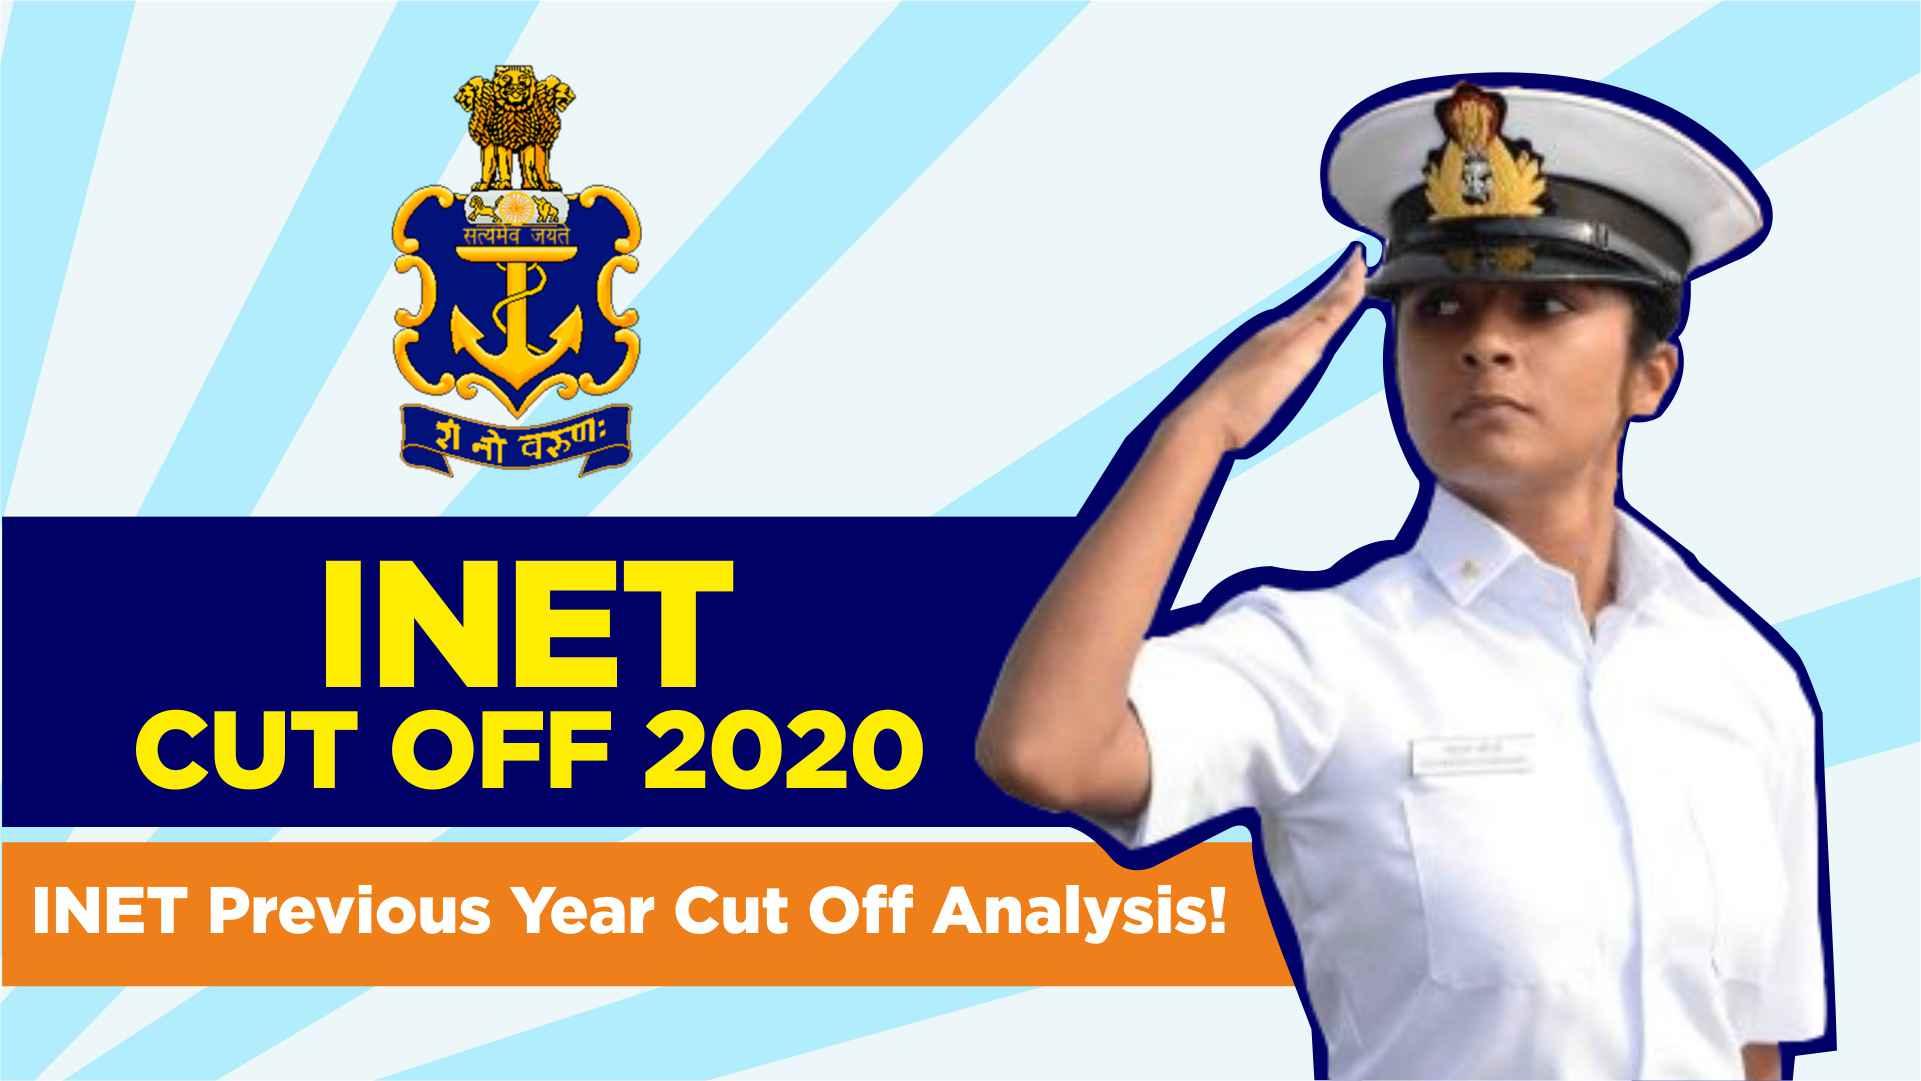 INET Cut Off Marks